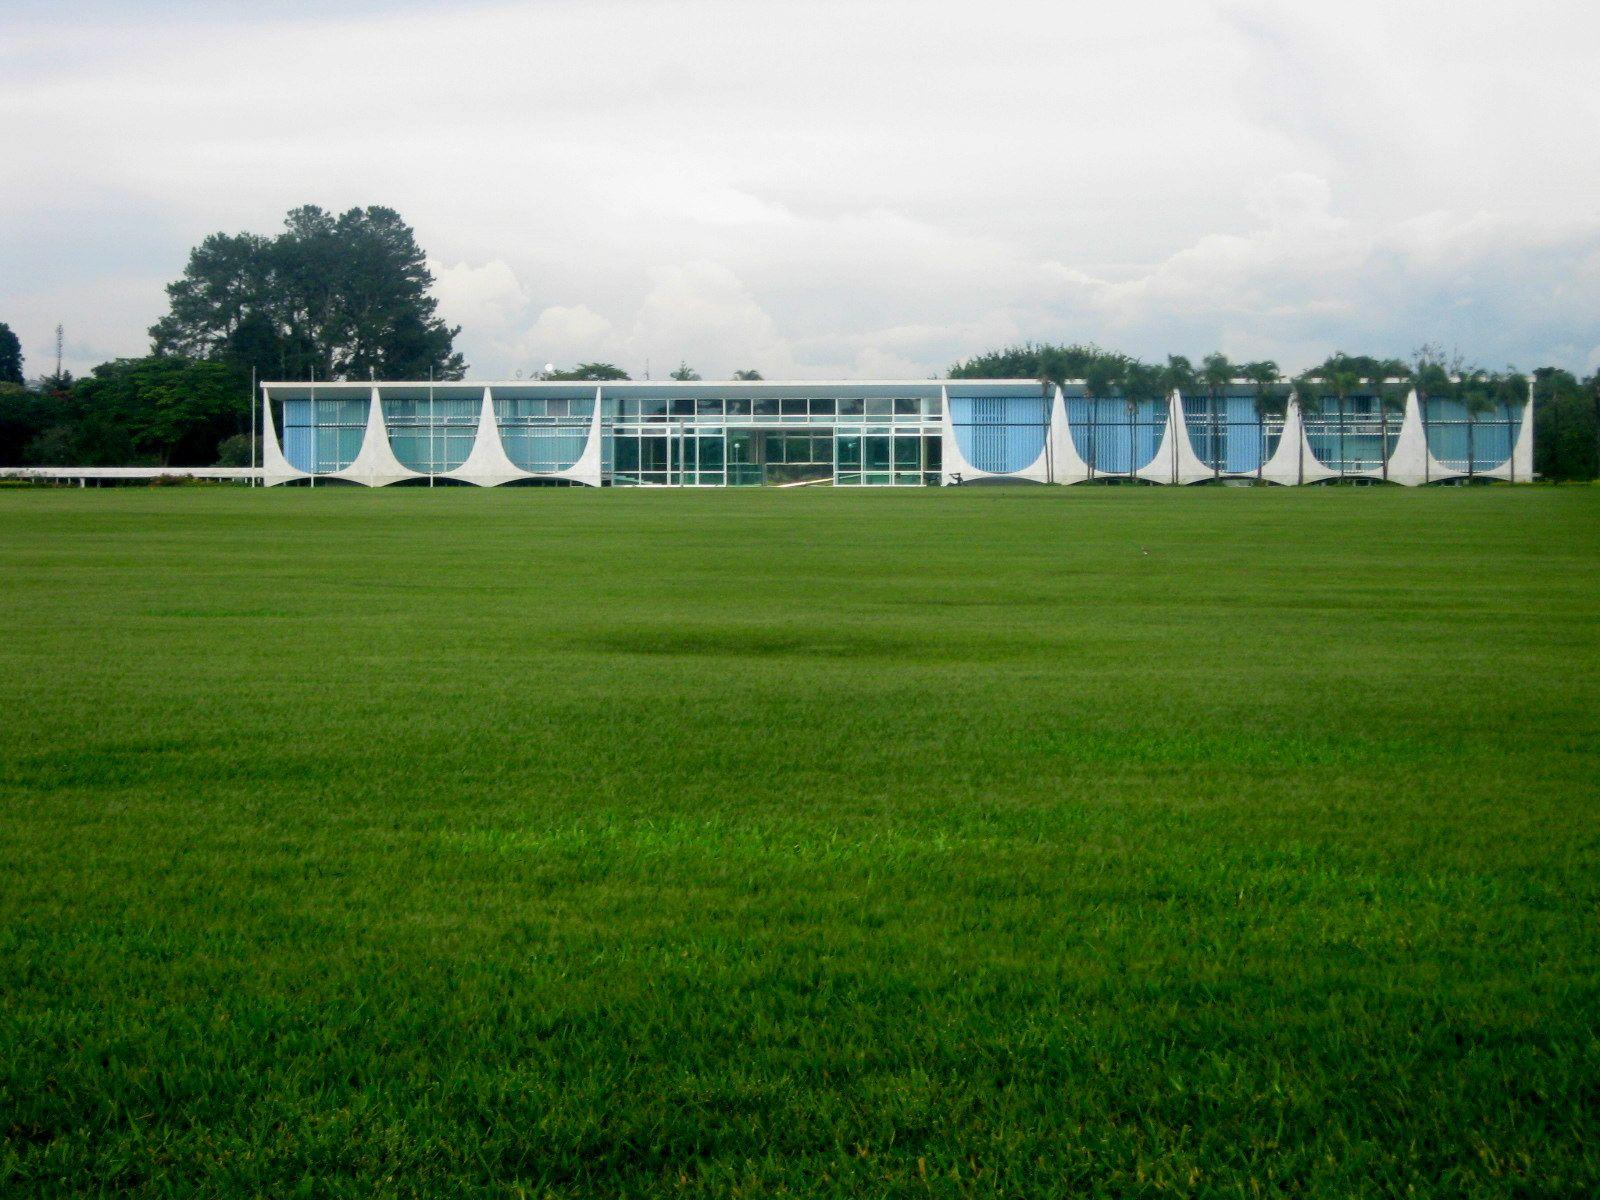 Palácio Alvorada - Brasilia